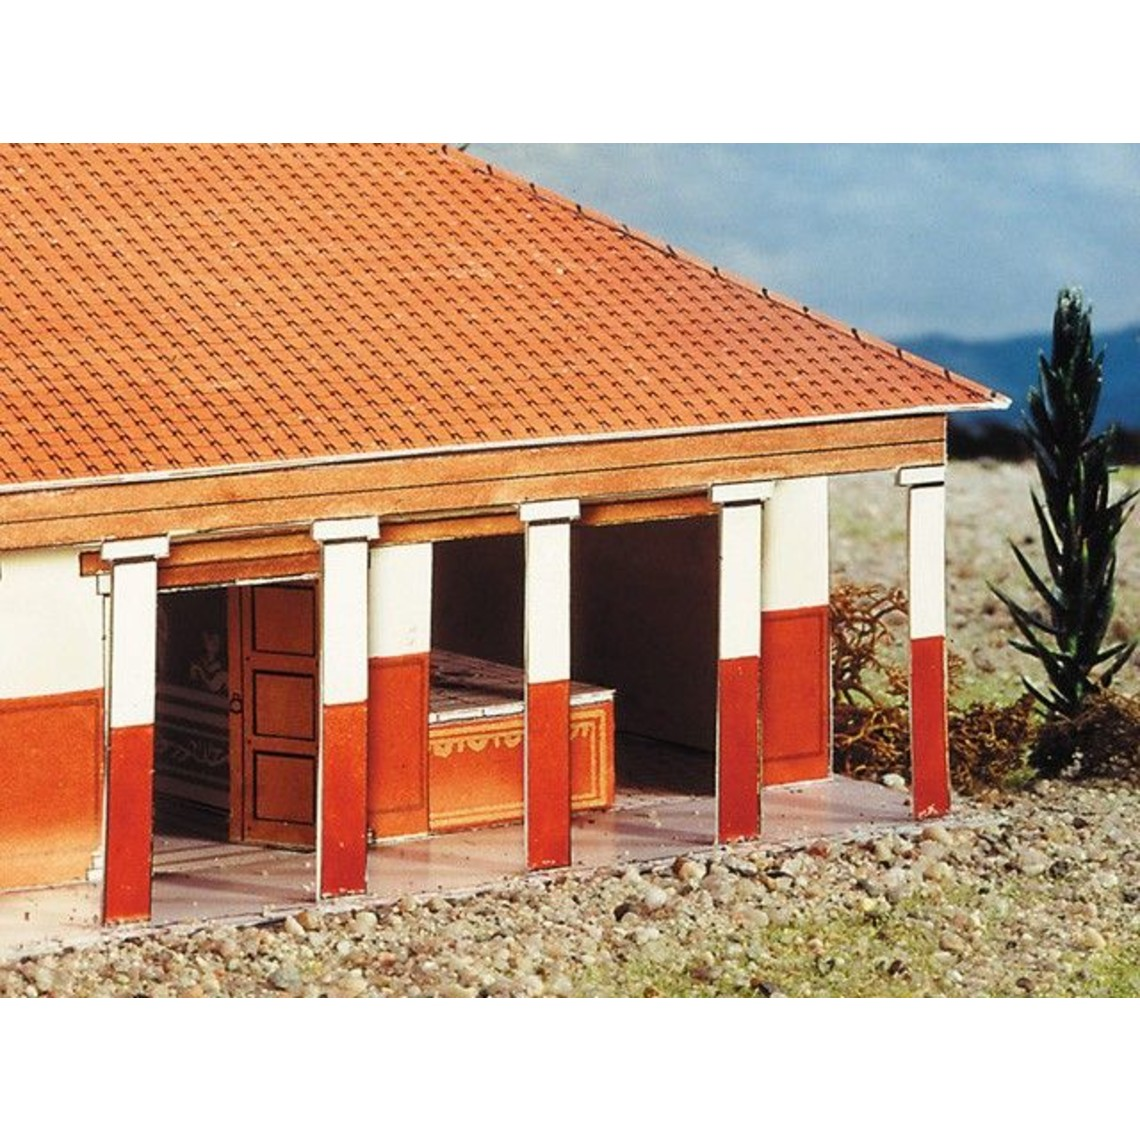 Model byggesæt romersk villa